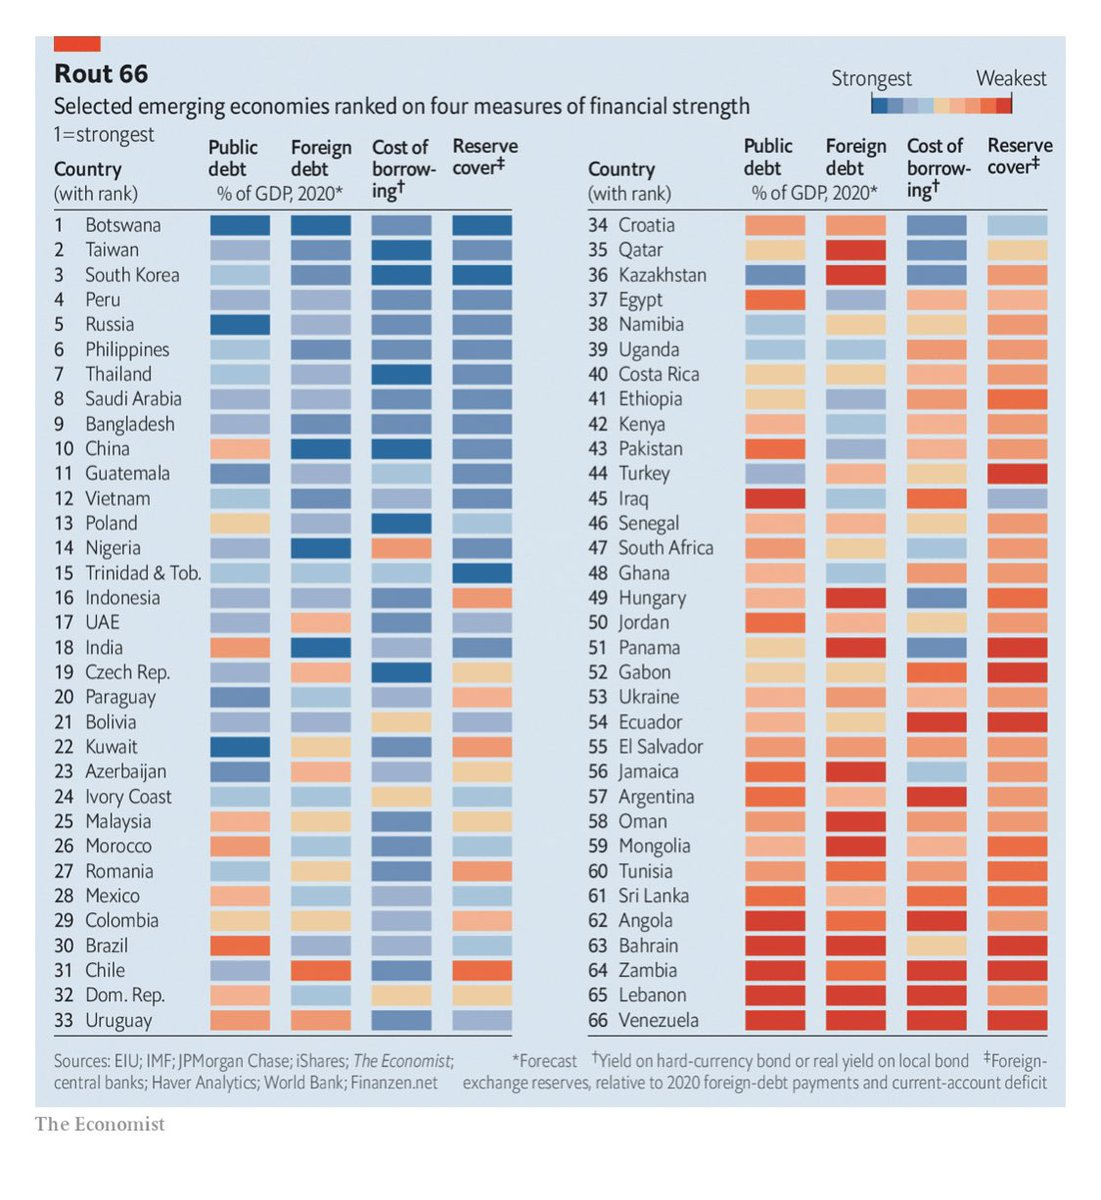 Botswana is currently the healthiest of 66 emerging economies around the world, according to @TheEconomist